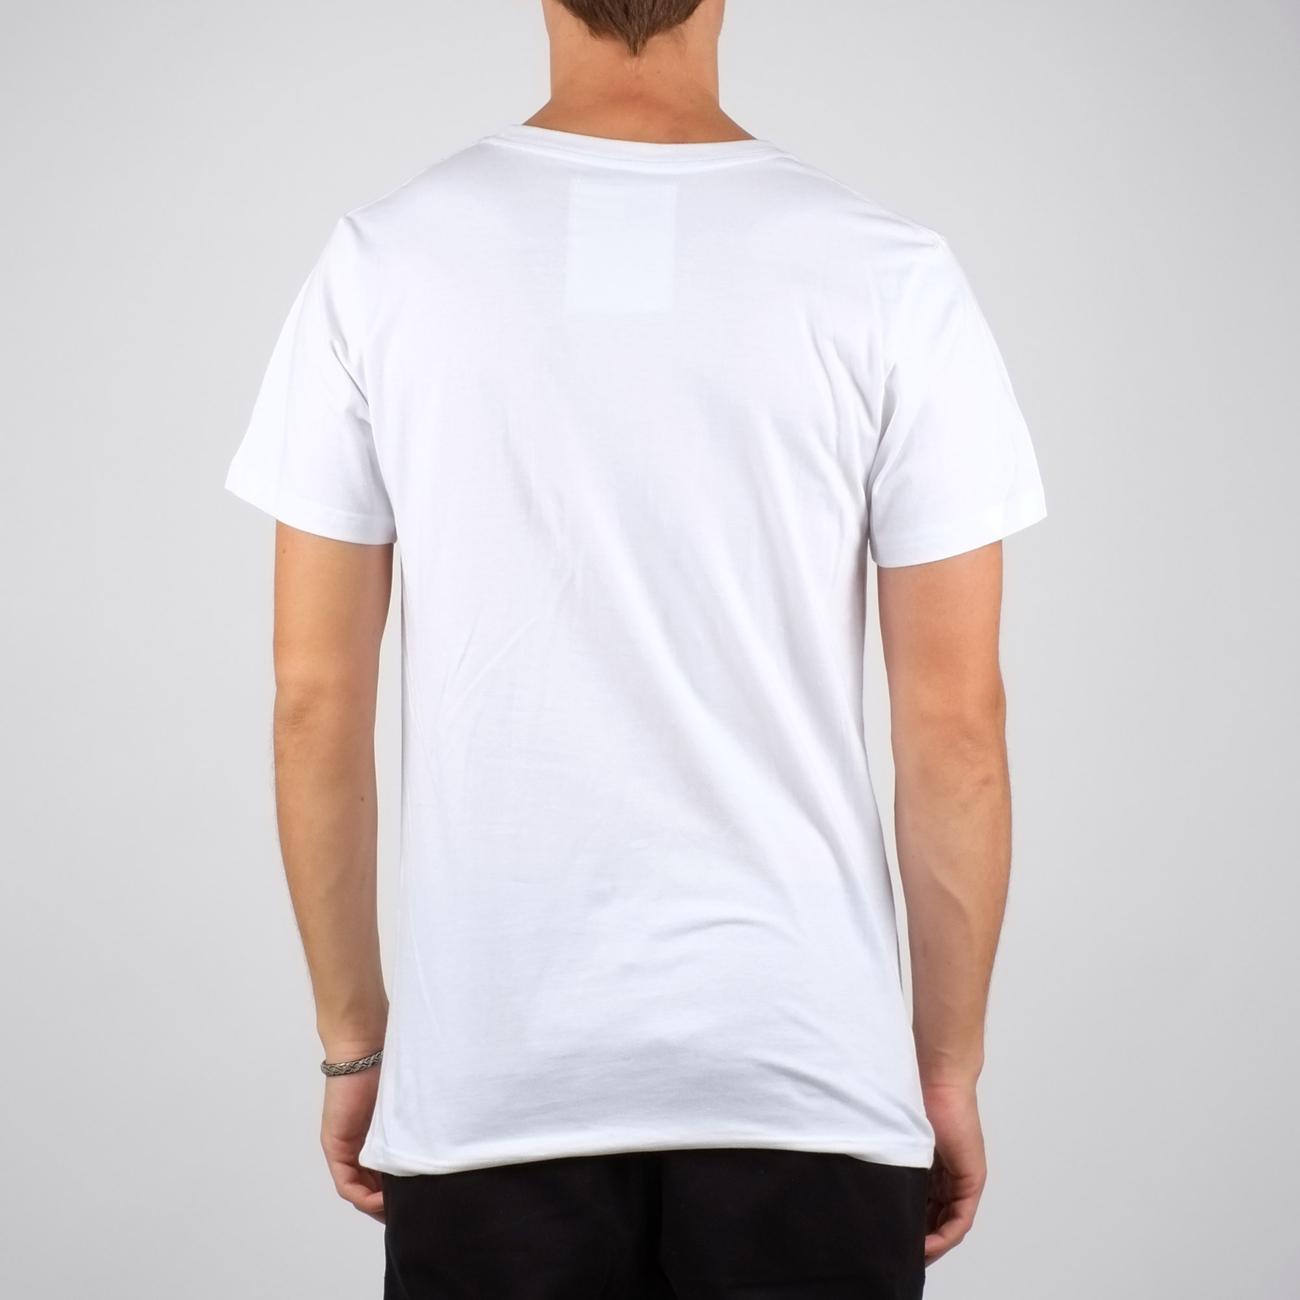 T-shirt Stockholm Vinyl Spin